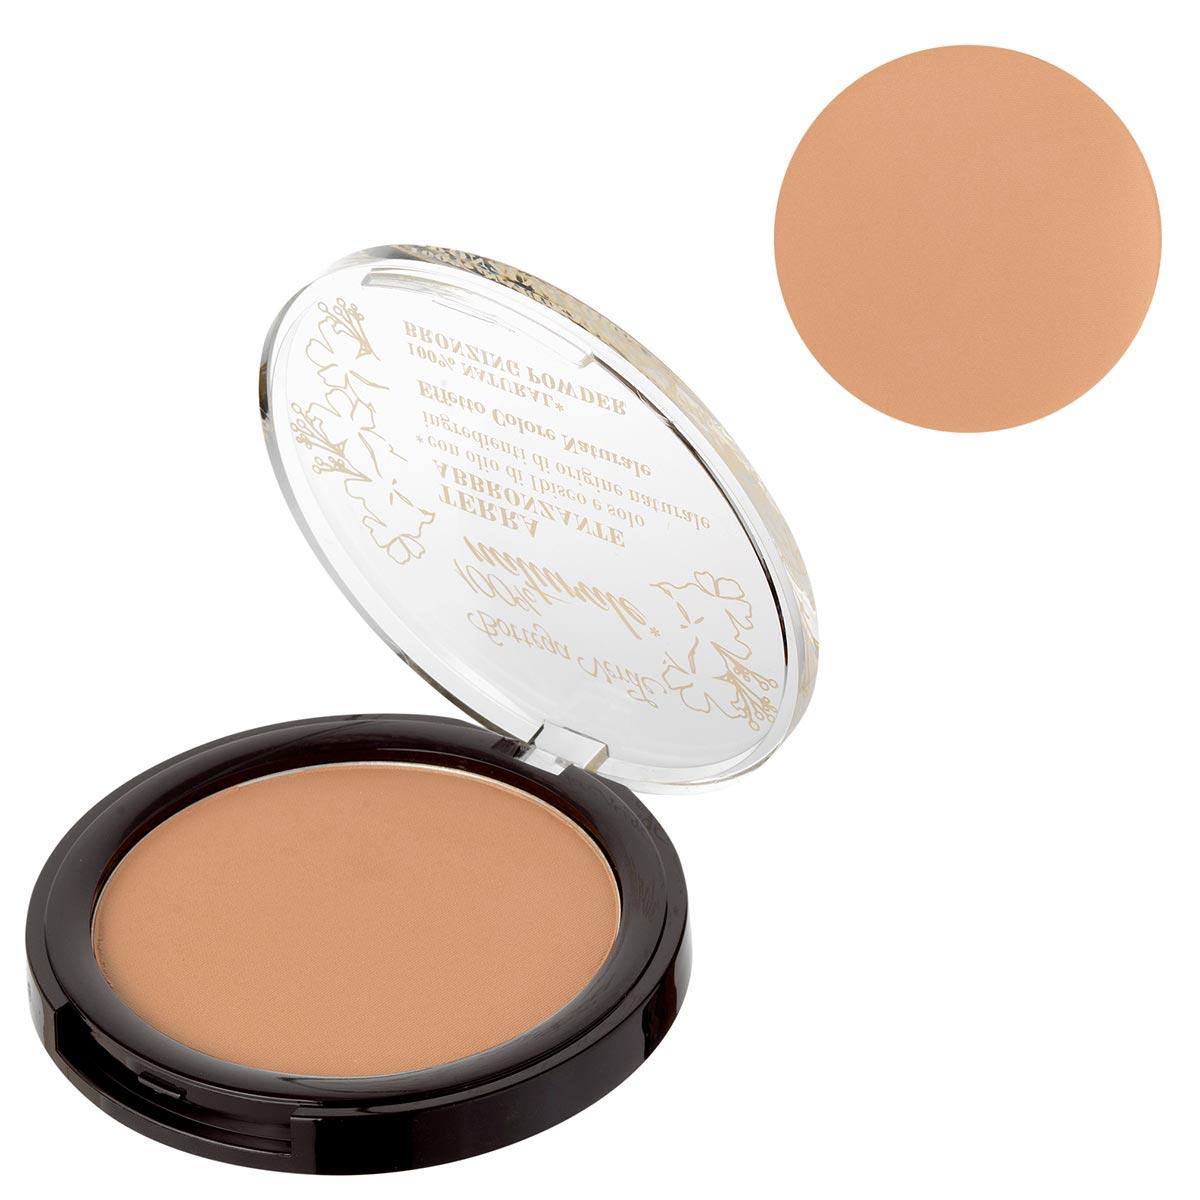 Pudra compacta bronzanta cu extract de ulei de hibiscus si ingrediente naturale, nude - 100% natural